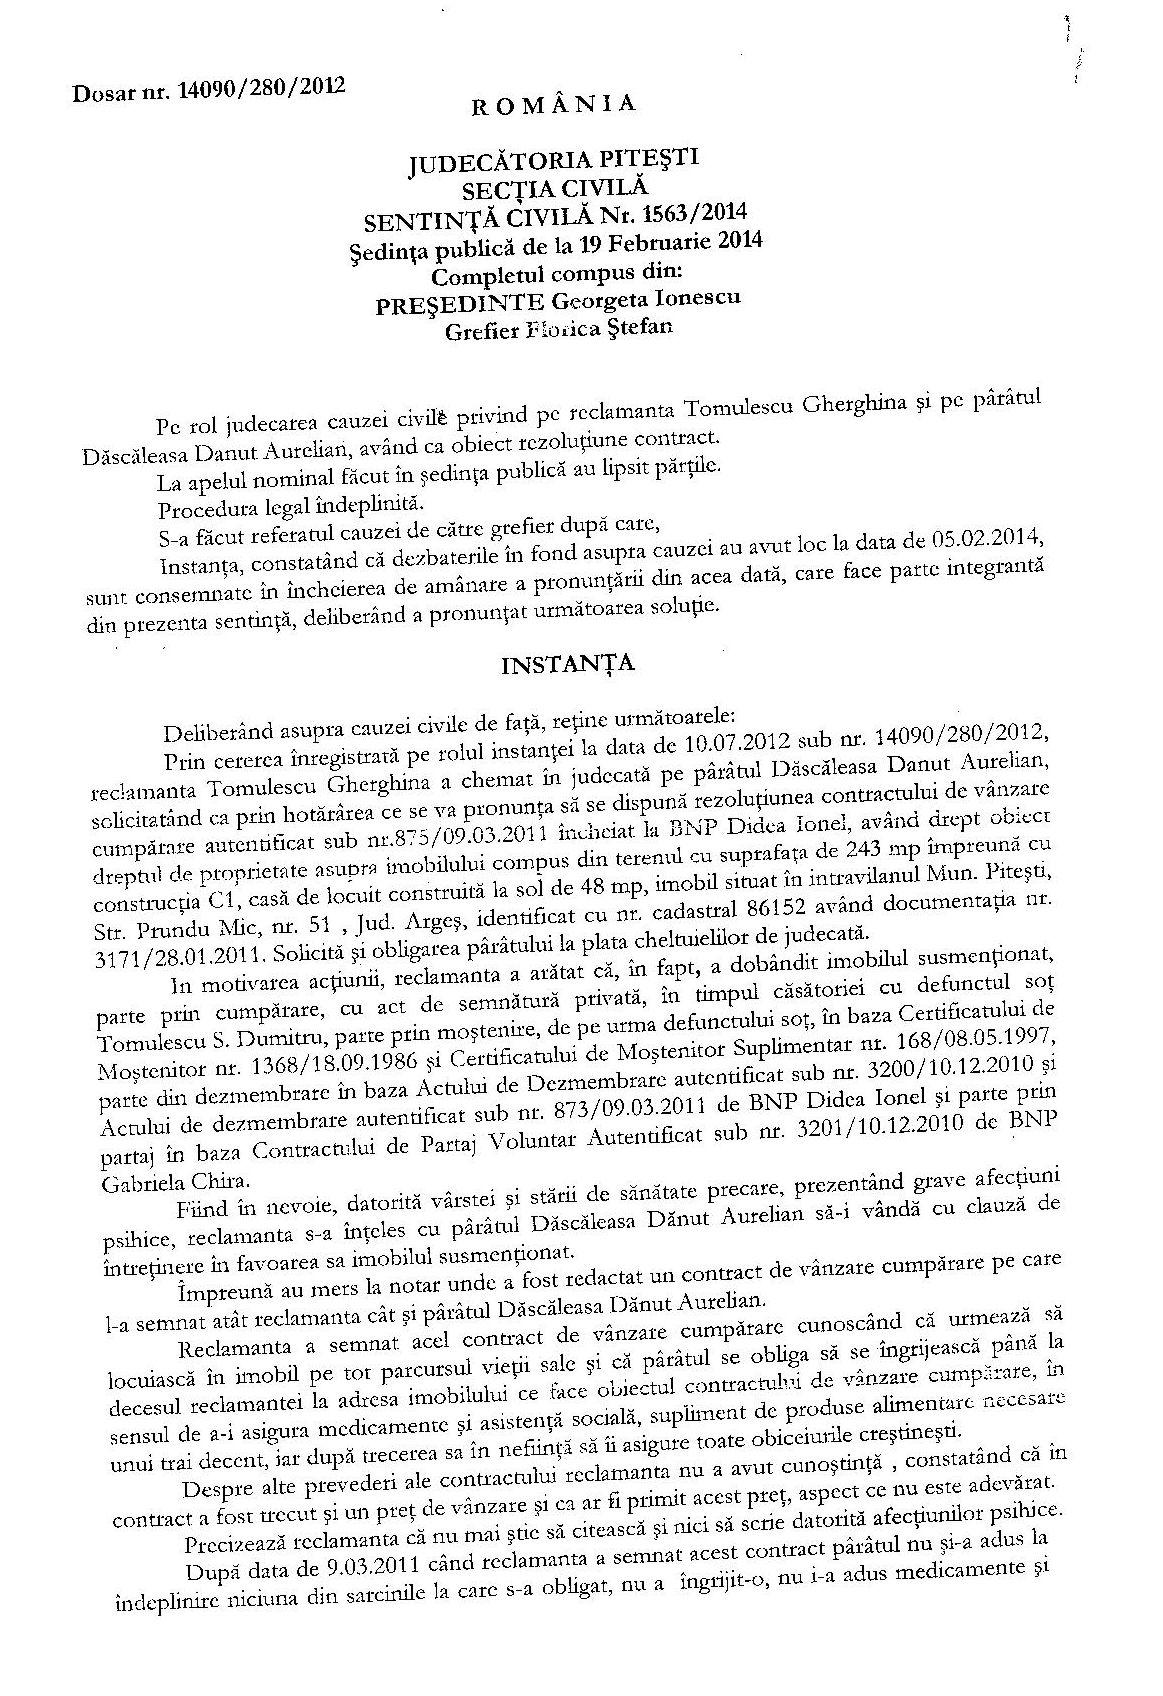 doc3 pag1 _sentinta civila abuziva judecatorie